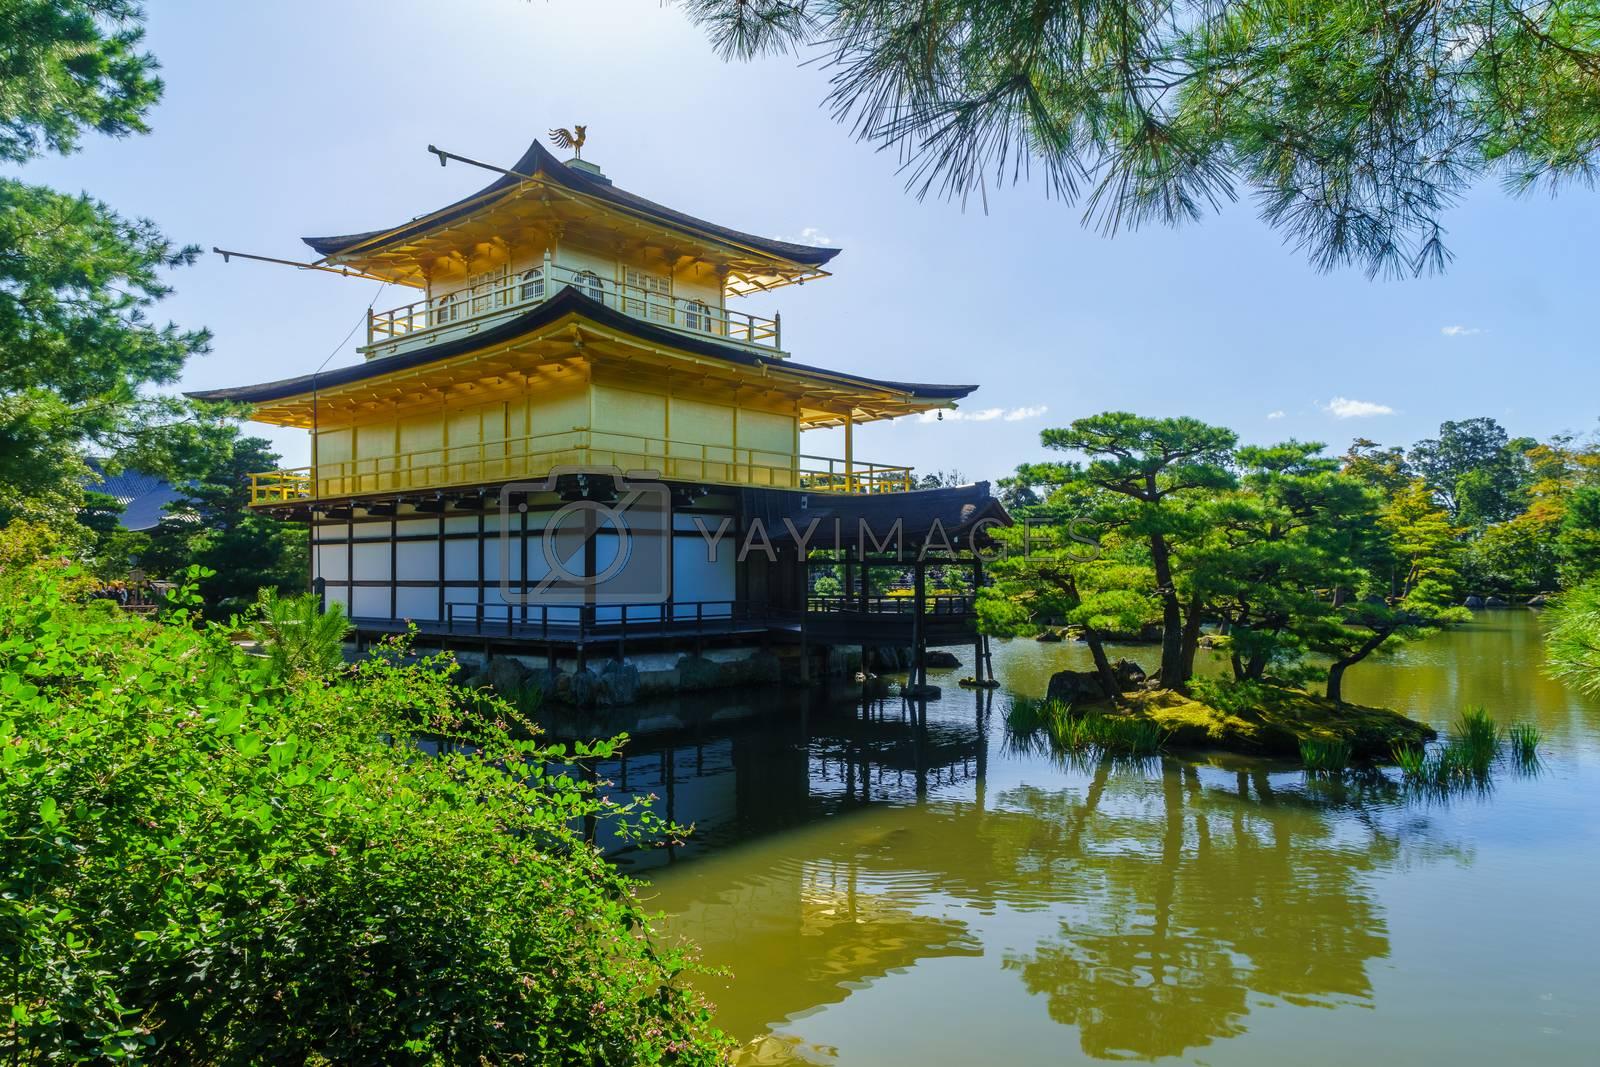 View of the shariden at Rokuon-ji Buddhist temple (the Golden Pavilion, Kinkakuji), in Kyoto, Japan